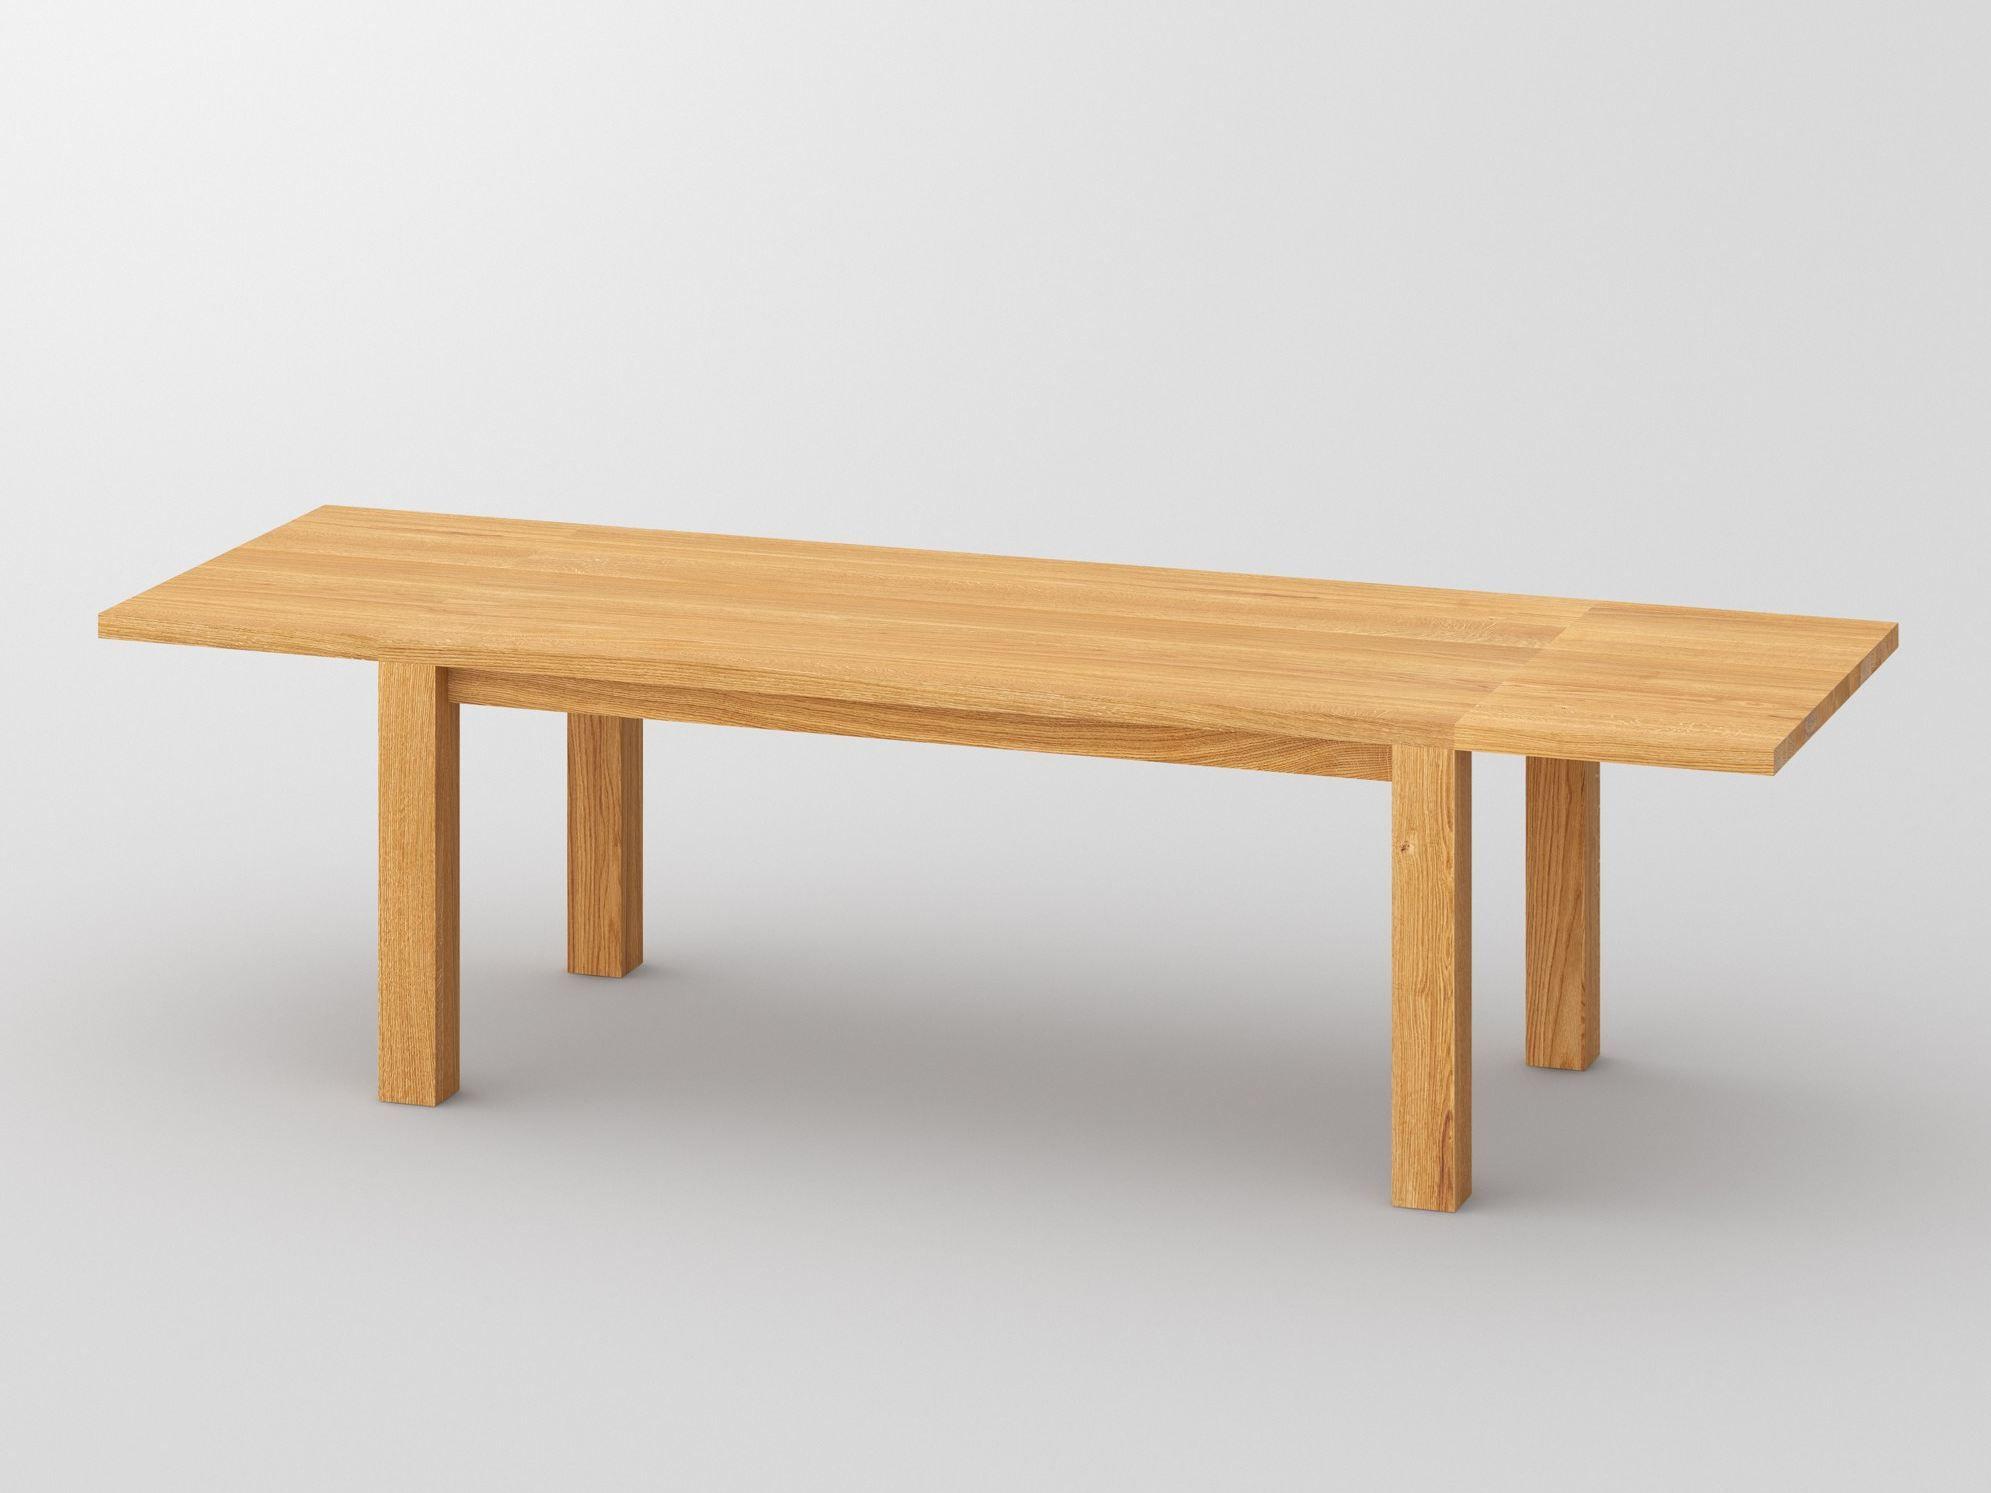 Tisch Design With CUBUS Ausziehbarer Tisch Kollektion Cubus By Vitamin  Design Also From Archiproducts.com